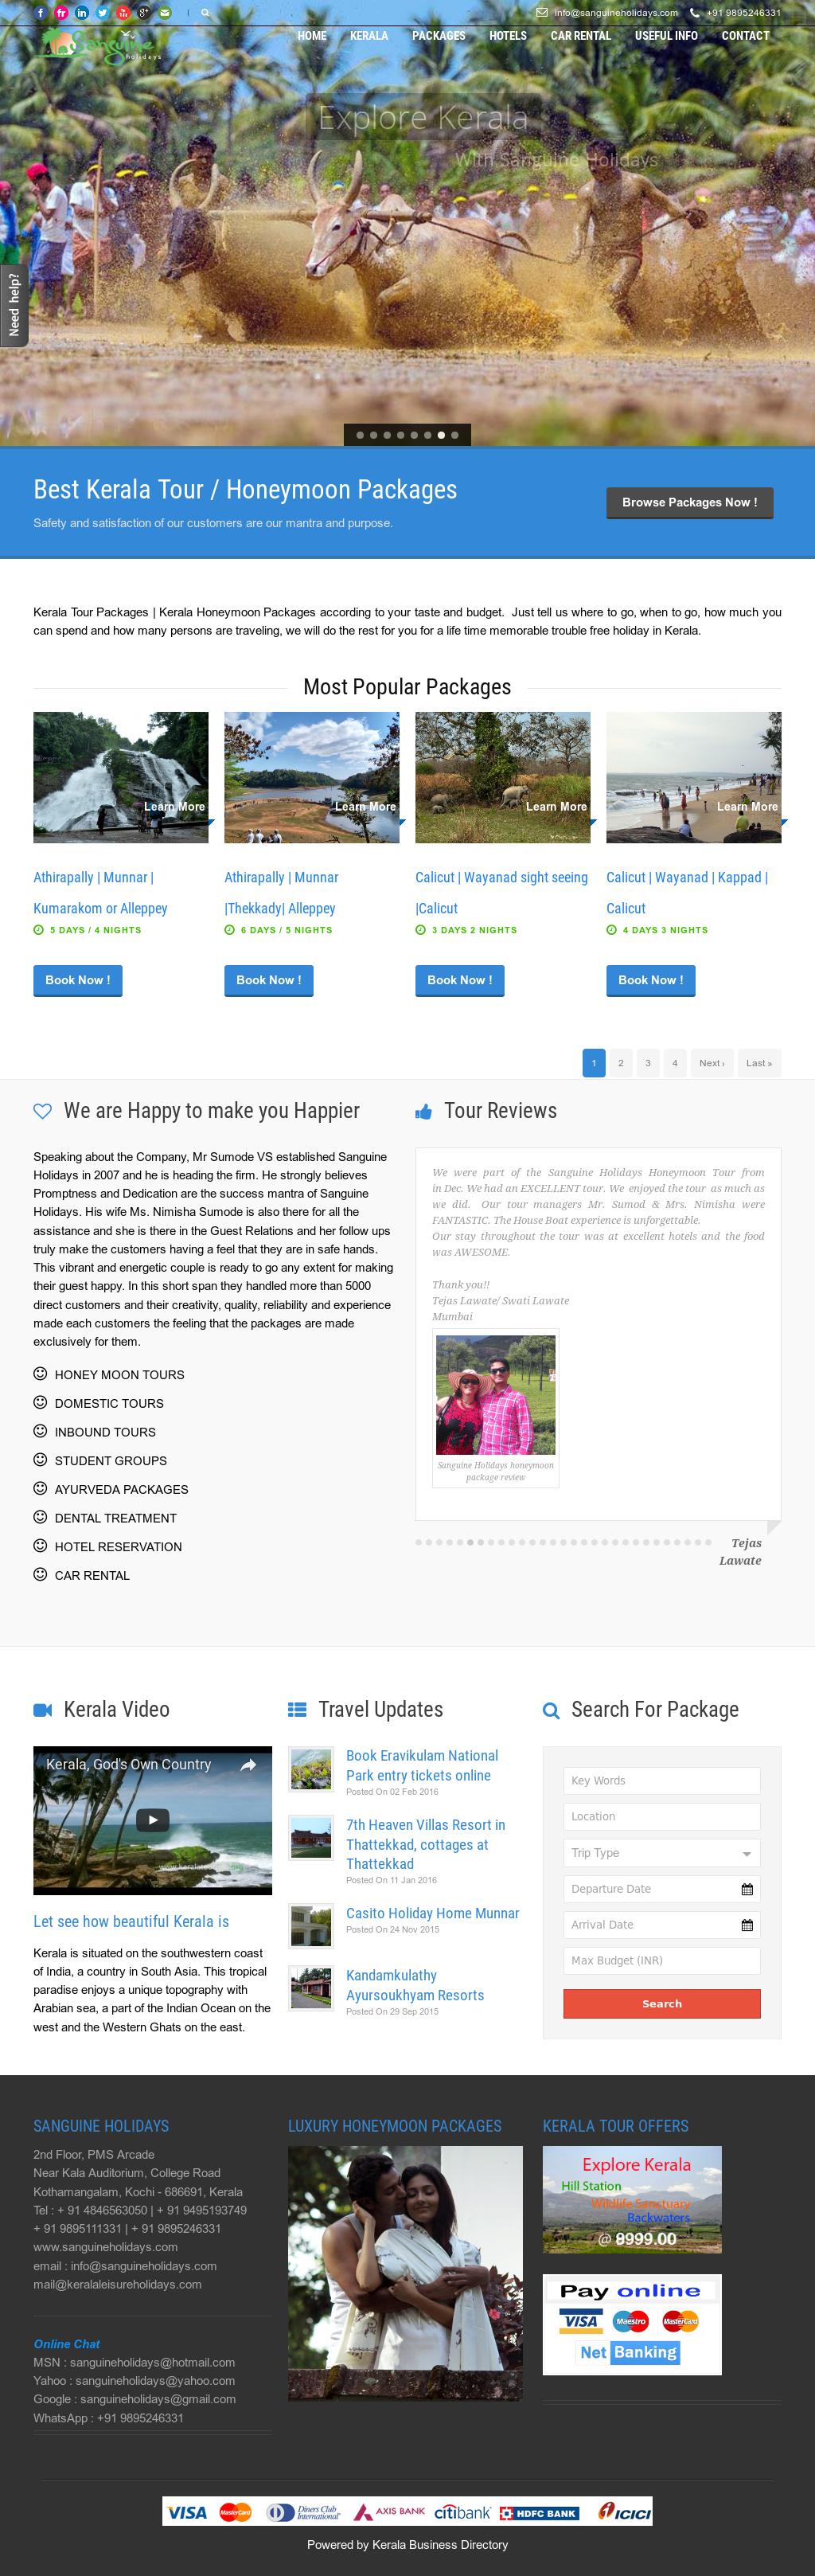 Kala 4 dating Website